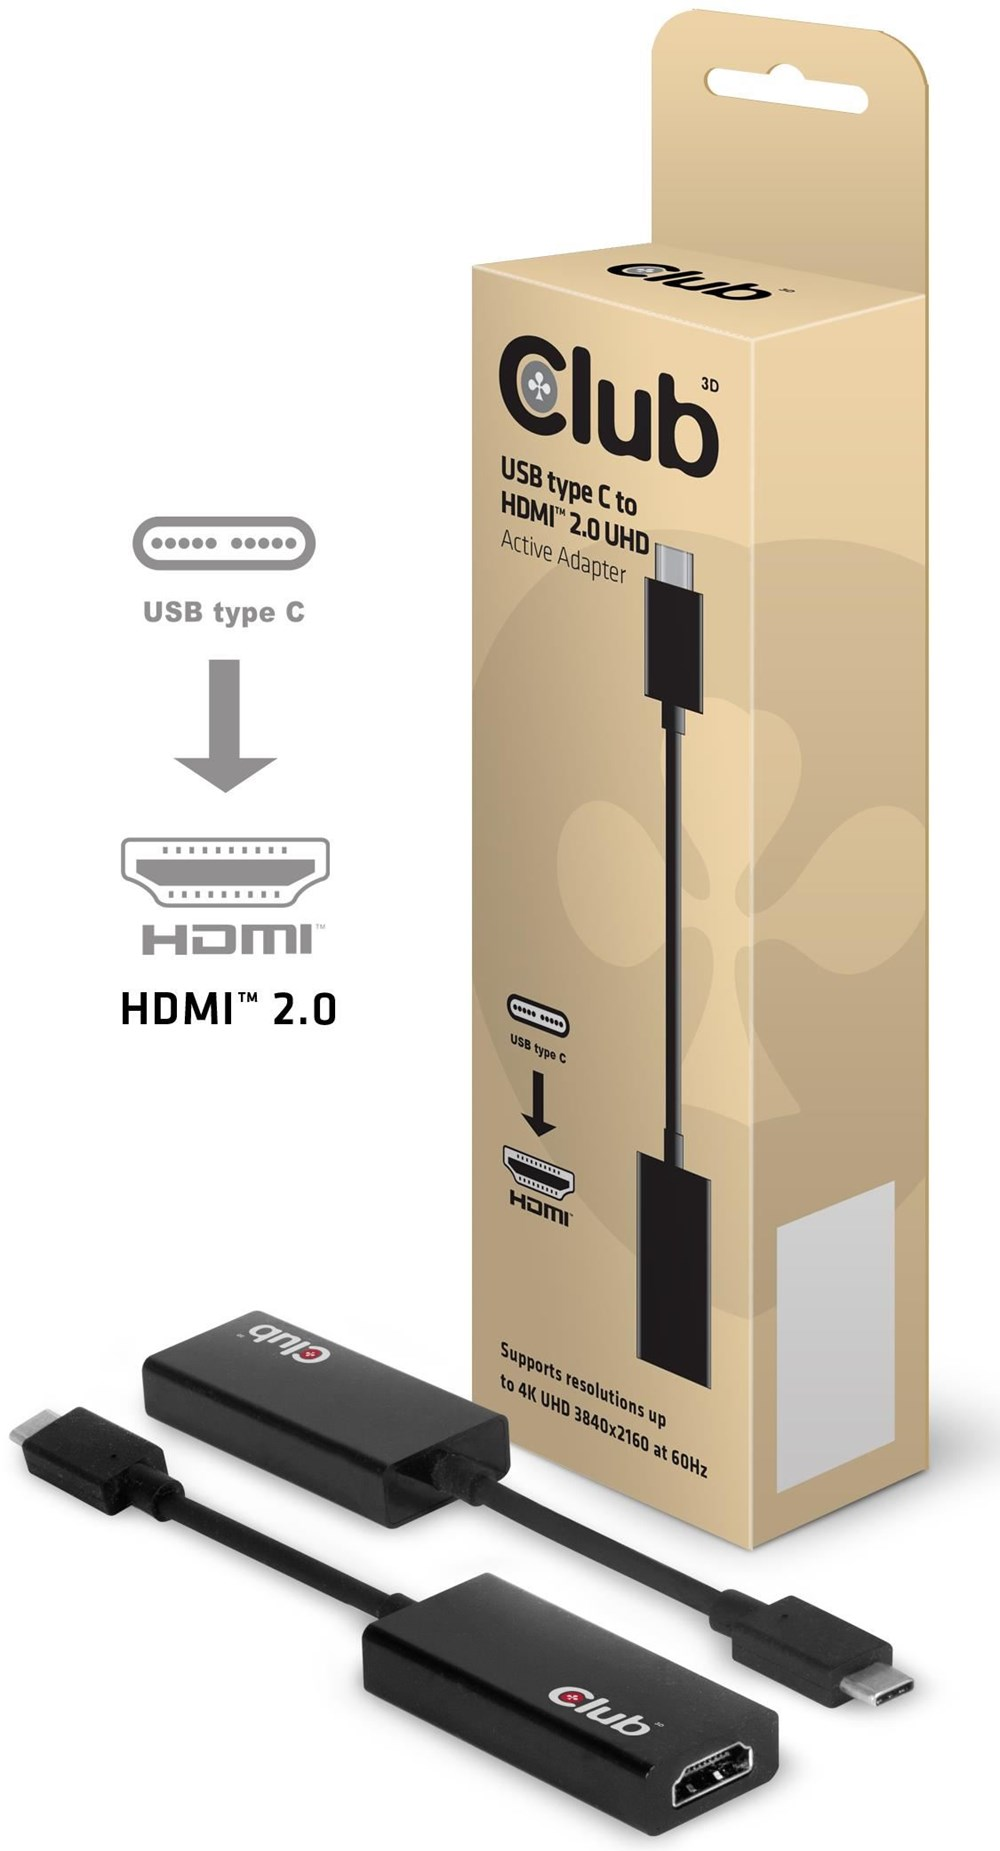 Club3D CAC-1504 USB 3.1 Typ C auf HDMI 2.0 4K60Hz UHD Aktiv USB3.1-C Stecker auf HDMI Buchse 0.15m schwarz